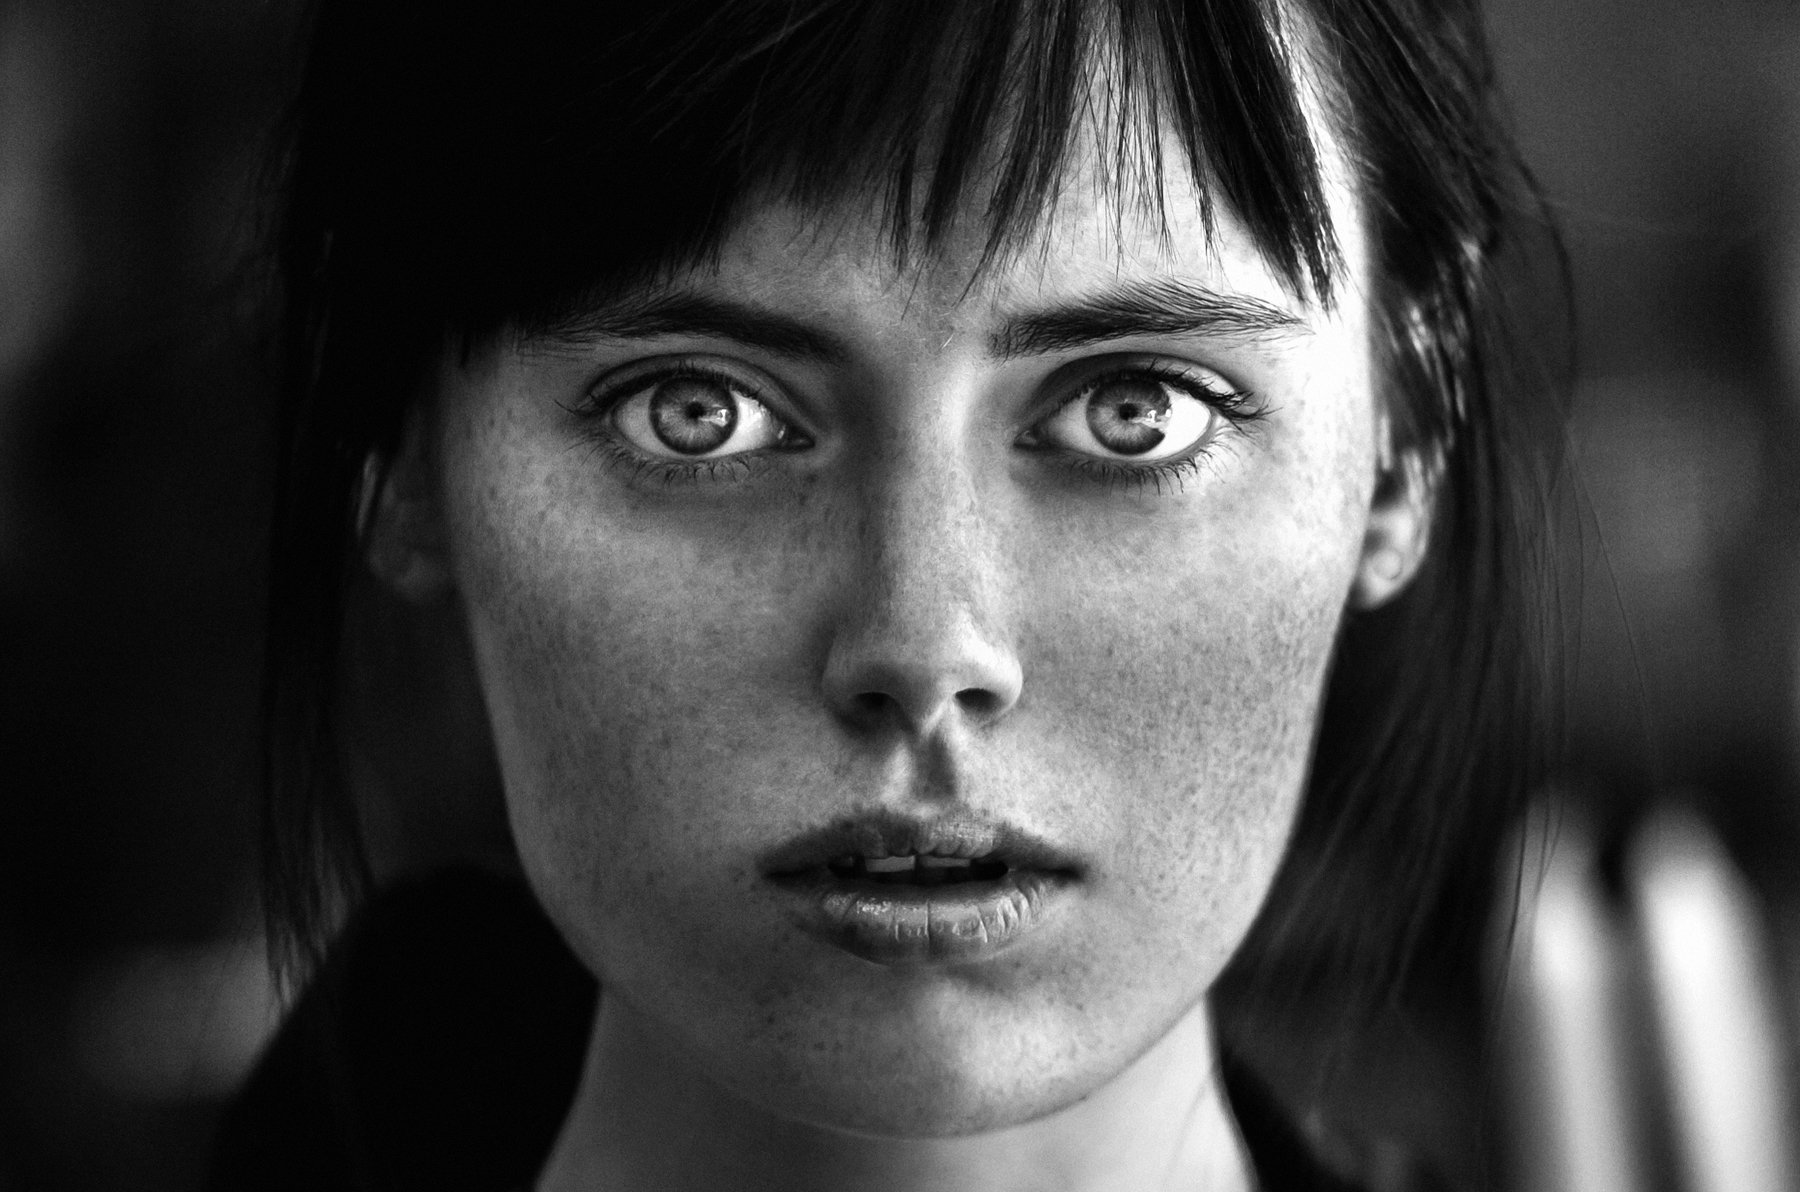 girl, portrait, bw, woman, emotions, eyes, face, photo, moscow, people, light, Андрей Лободин